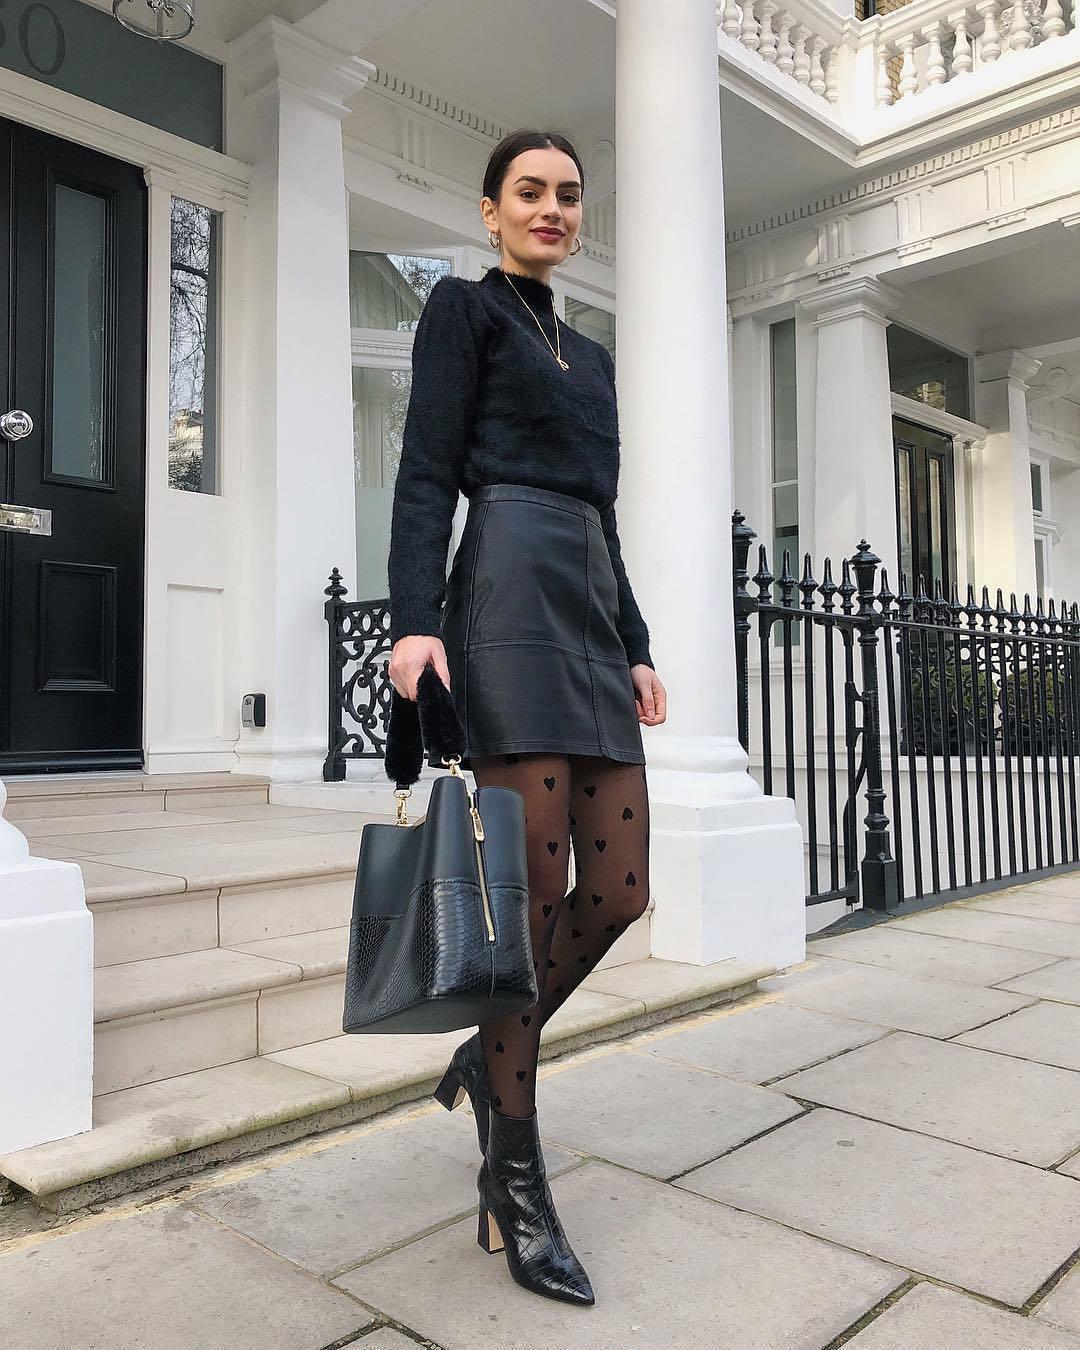 skirt black leather skirt high waisted skirt black boots ankle boots tights black bag black sweater